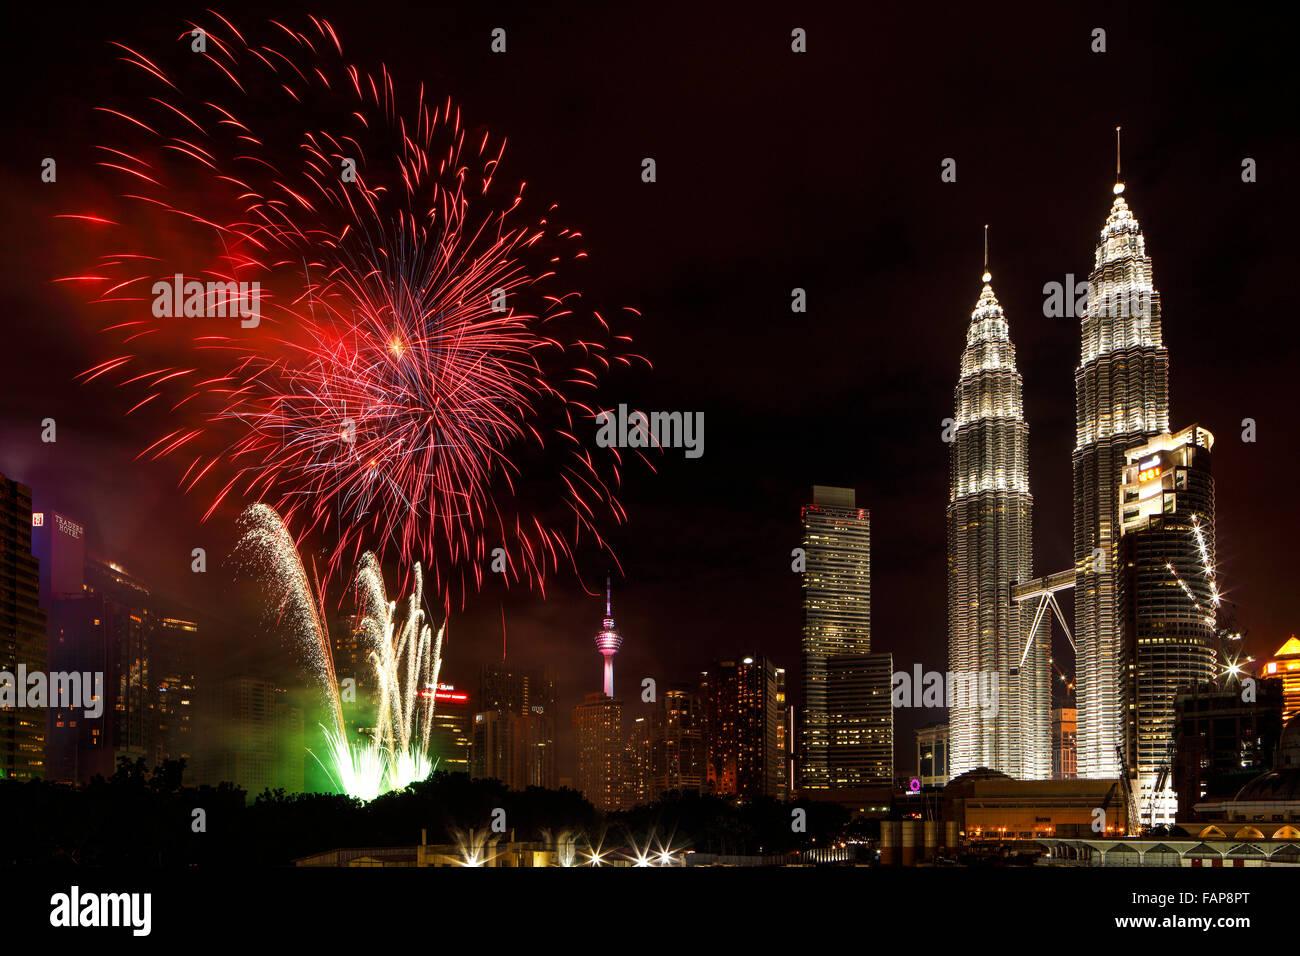 The 2016 New Year's Fireworks Celebration at KLCC, Malaysia. Stock Photo